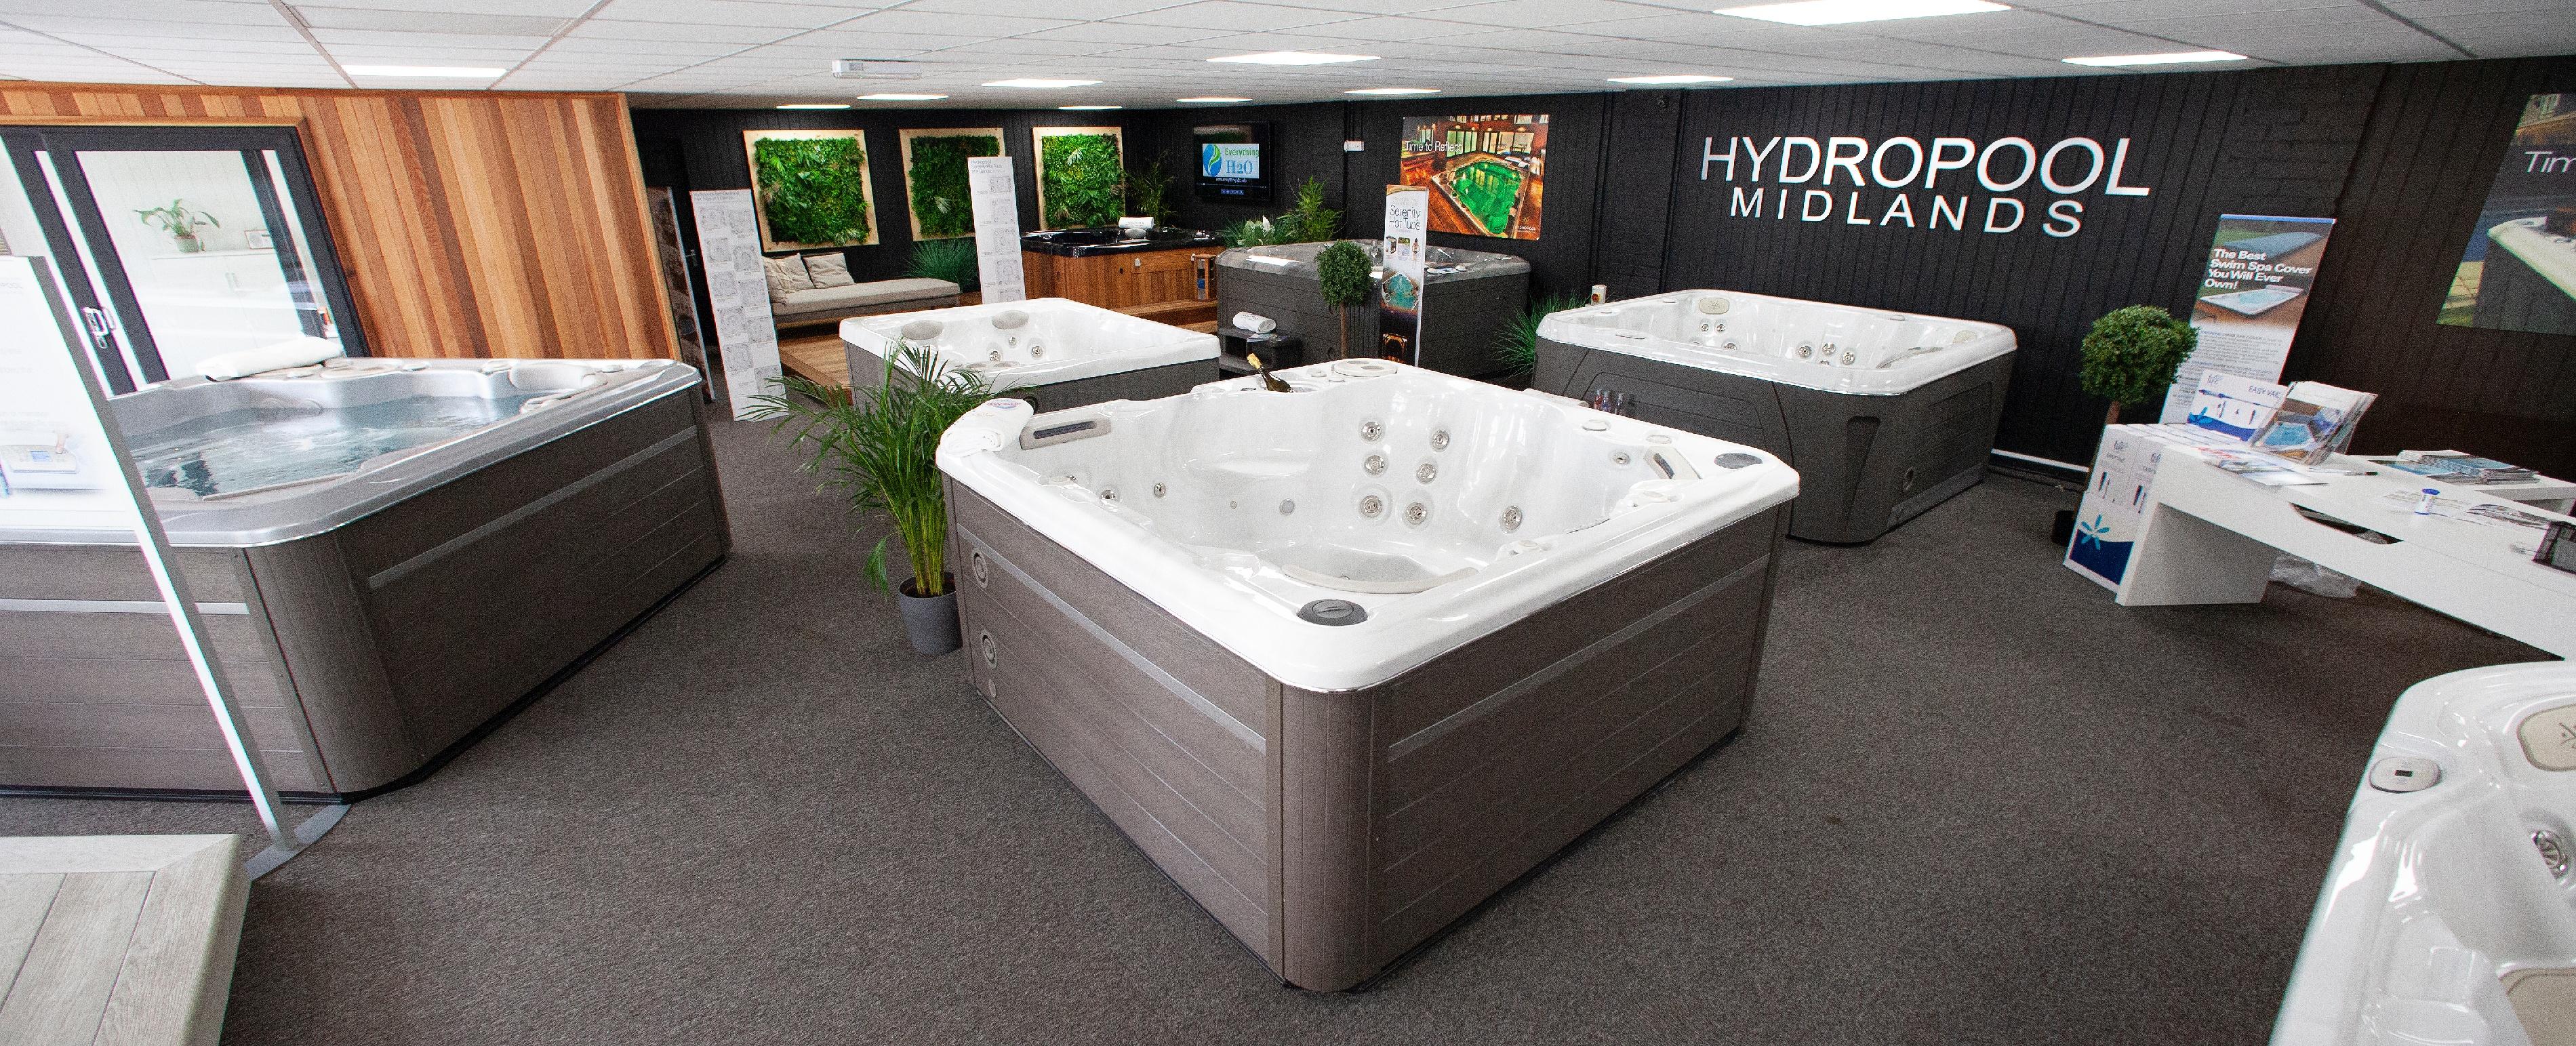 Hydropool_Midlands_Showroom_Hot_Tub_Nottingham_017a-1